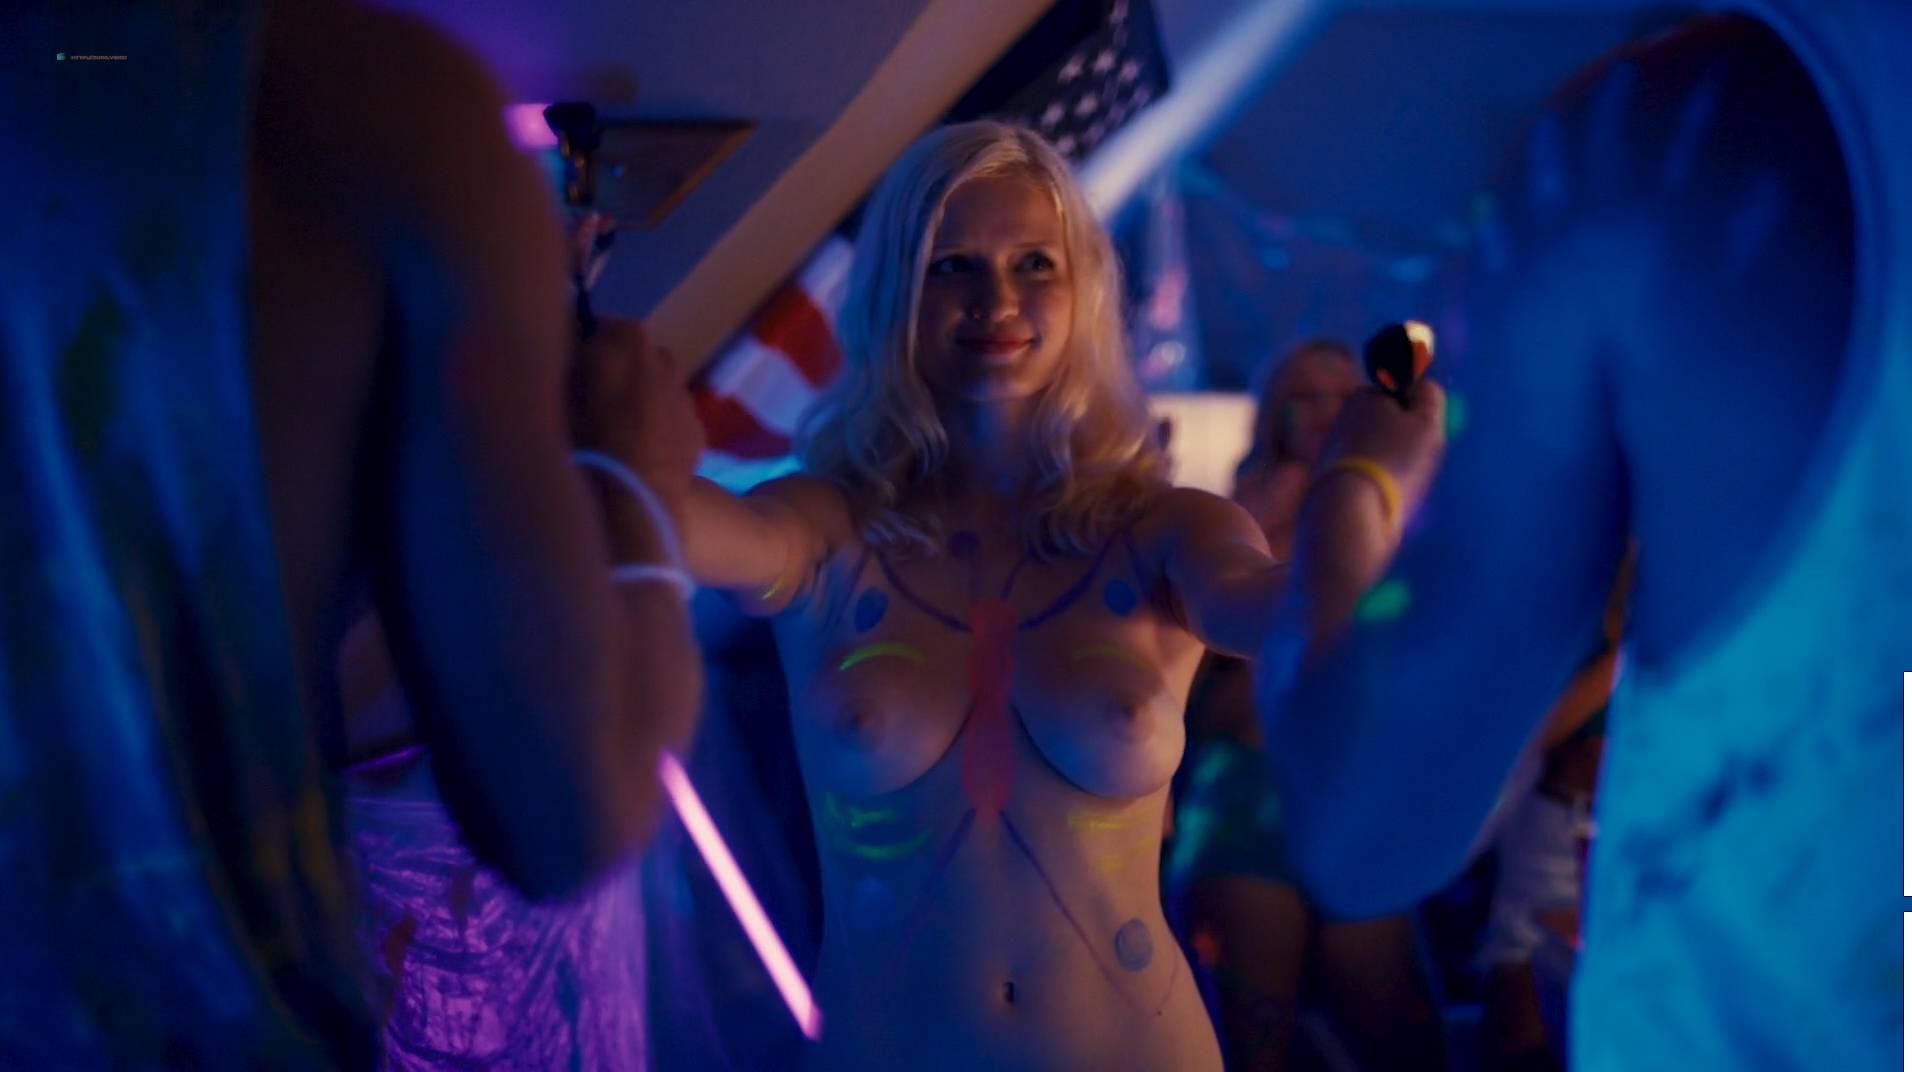 Jennifer Krukowski nude topless Aubrey Ferron and others all nude - Total Frat Movie (2016.) HD 1080p WEB (7)